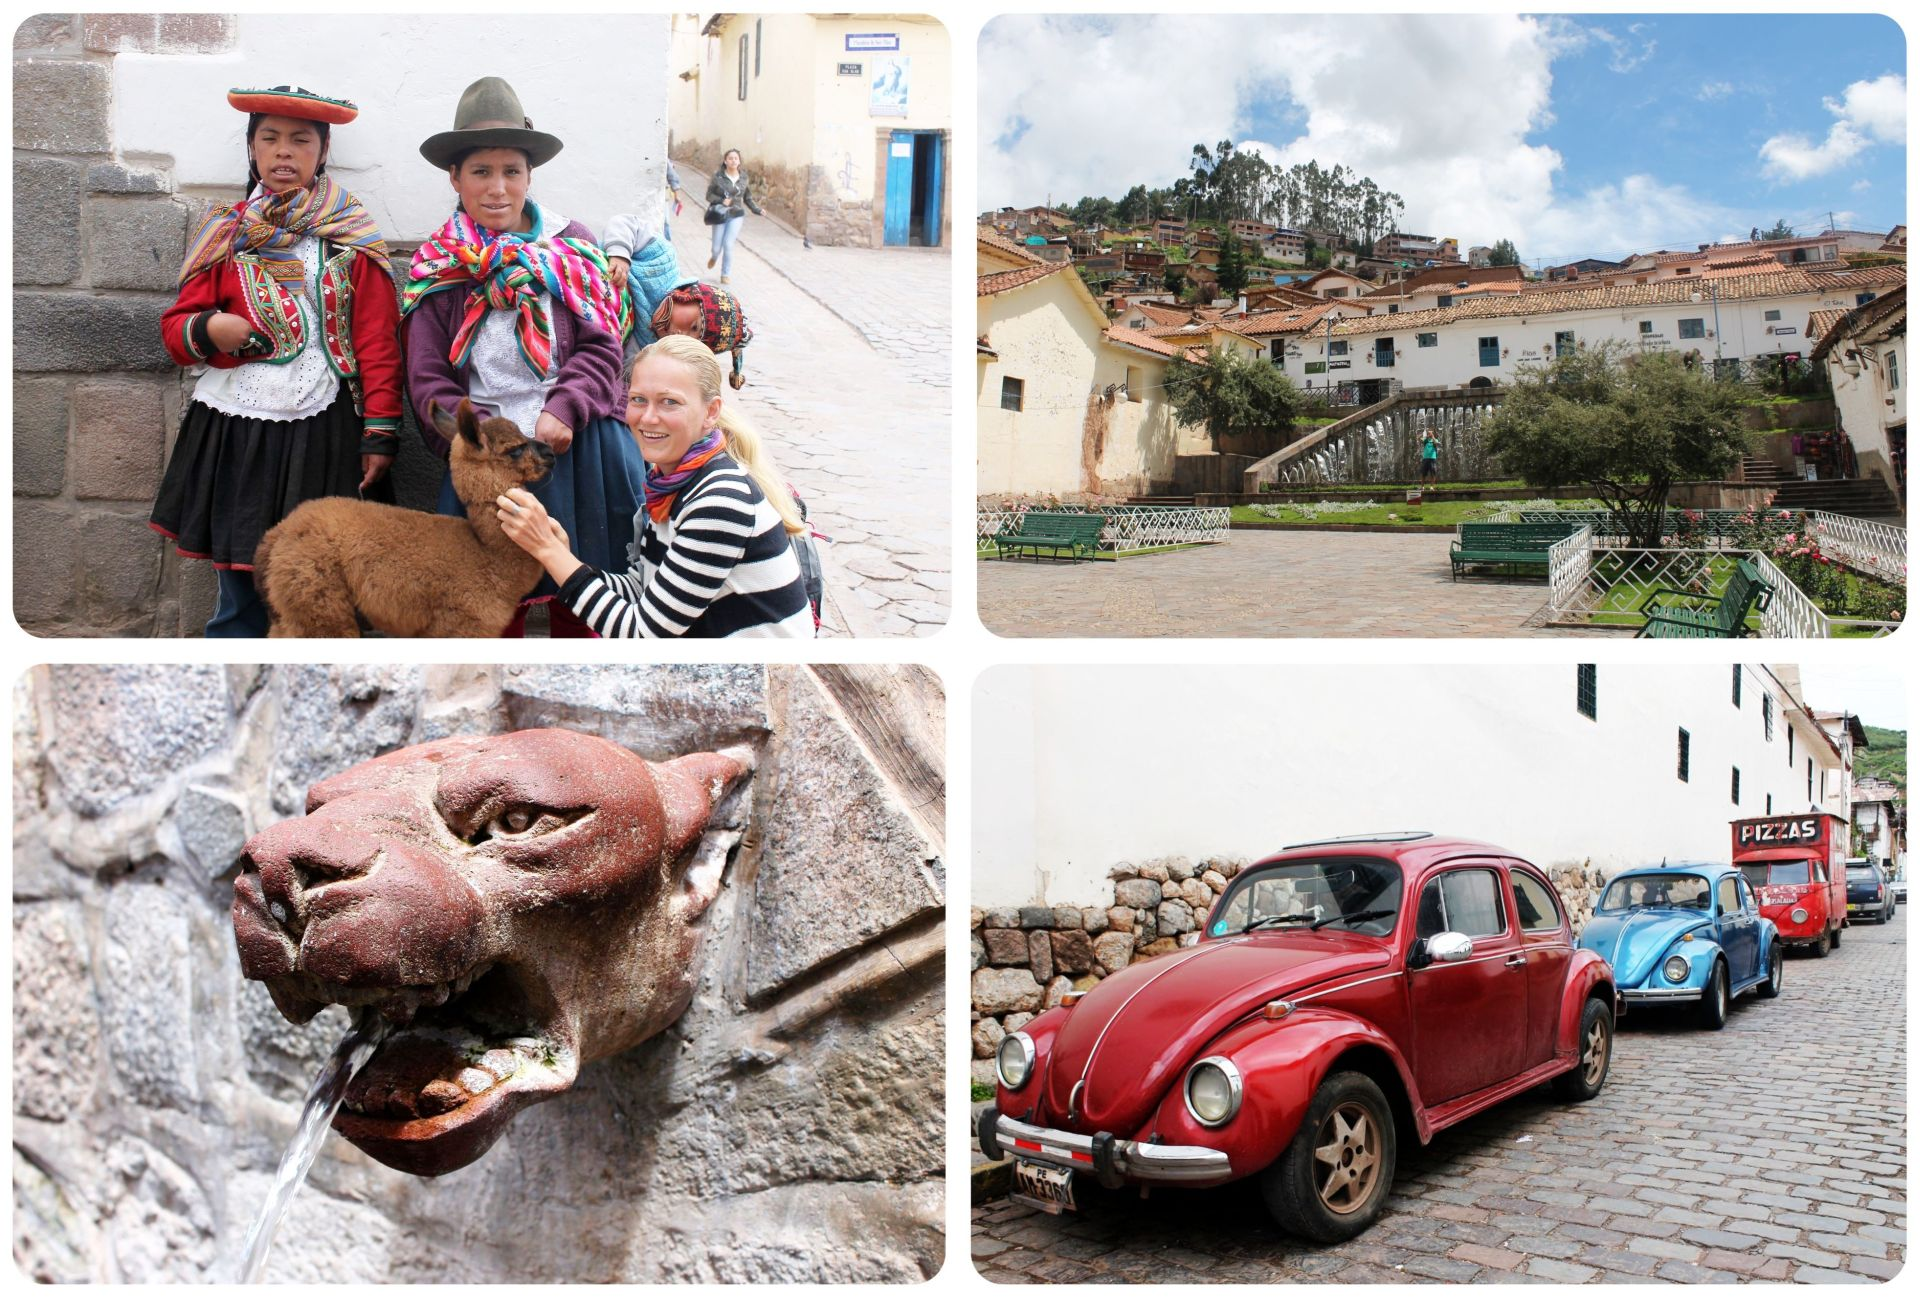 visit Cuzco